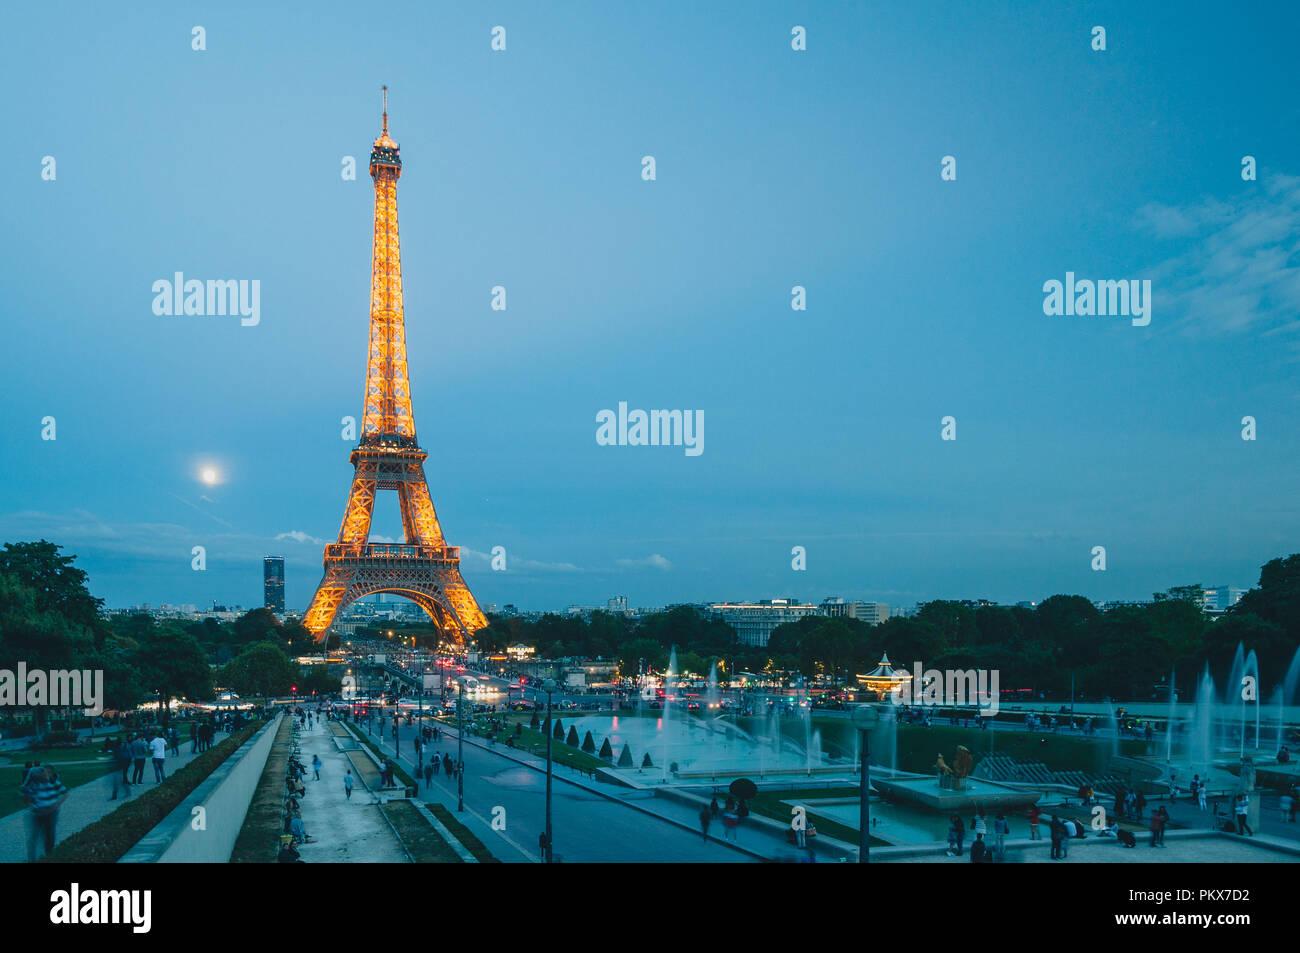 Eiffel Tower at Trocadero - Stock Image